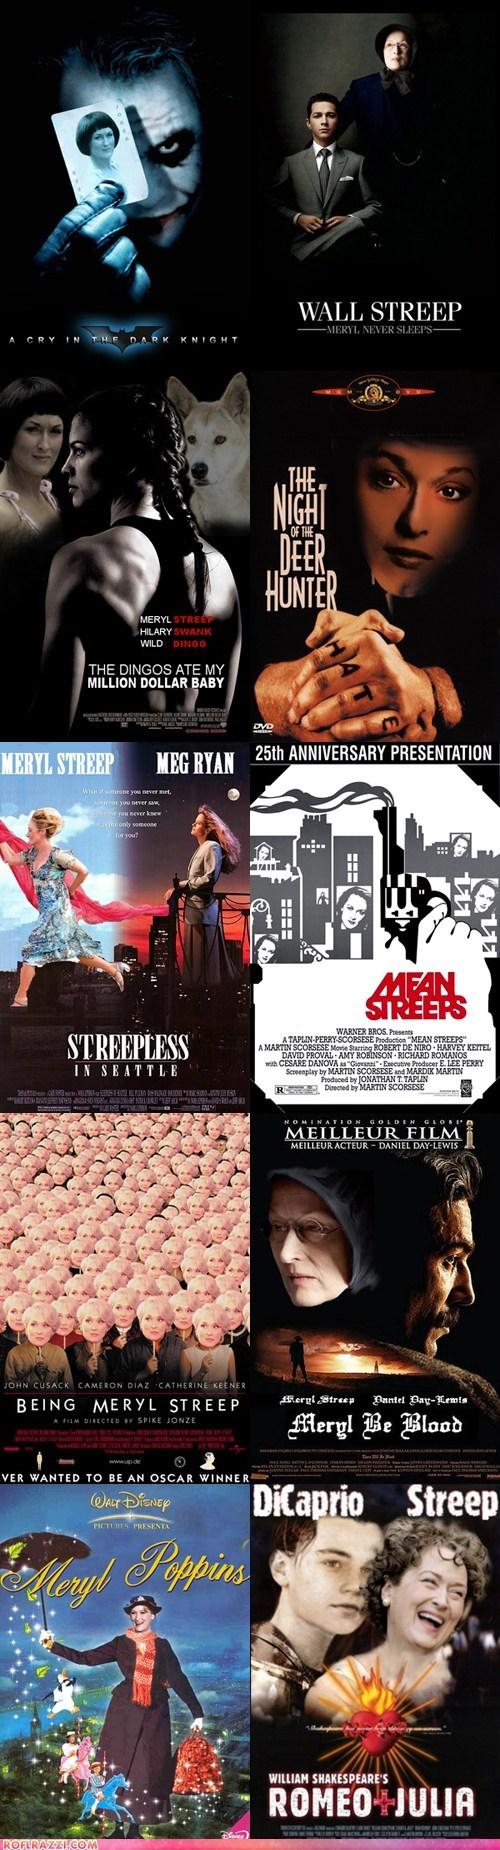 actor,celeb,flawless,Meryl Streep,Movie,poster,sexy,shoop